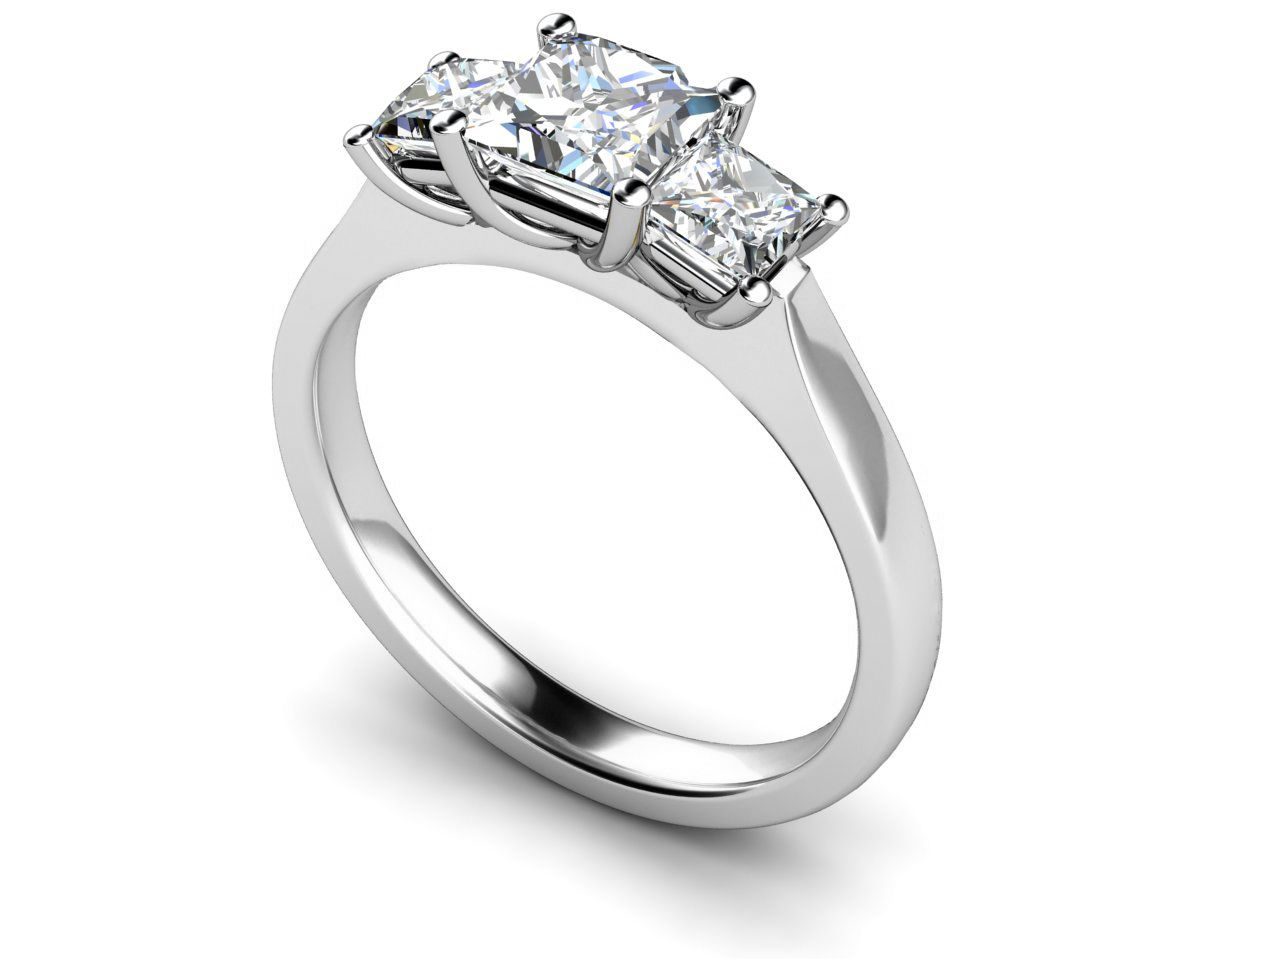 #diamonds #rings #engagementring #weddingring #wedding #bridal #sterlingdiamonds.co.uk